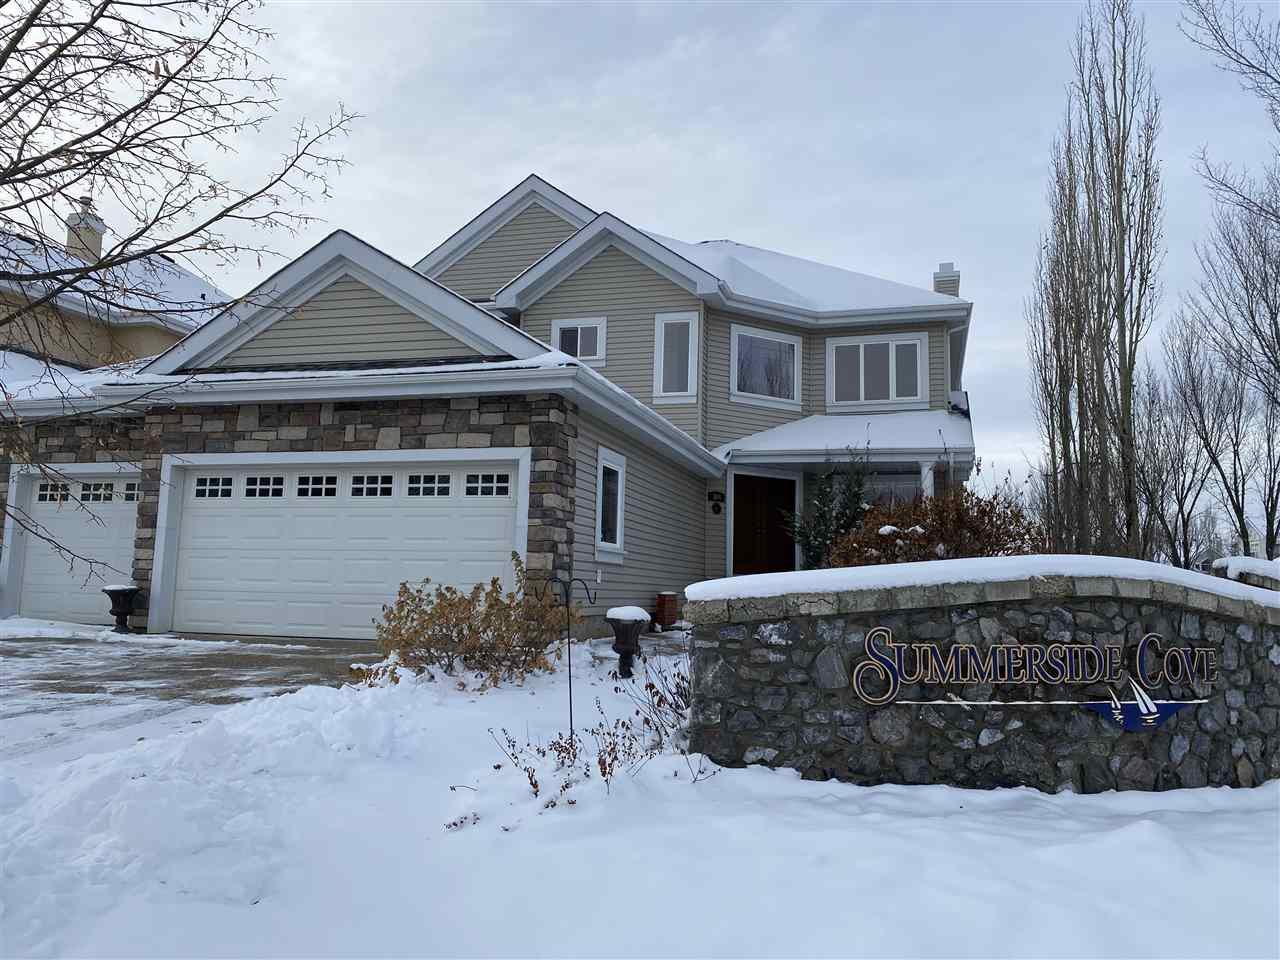 Main Photo: 304 SUMMERSIDE Cove in Edmonton: Zone 53 House for sale : MLS®# E4219128